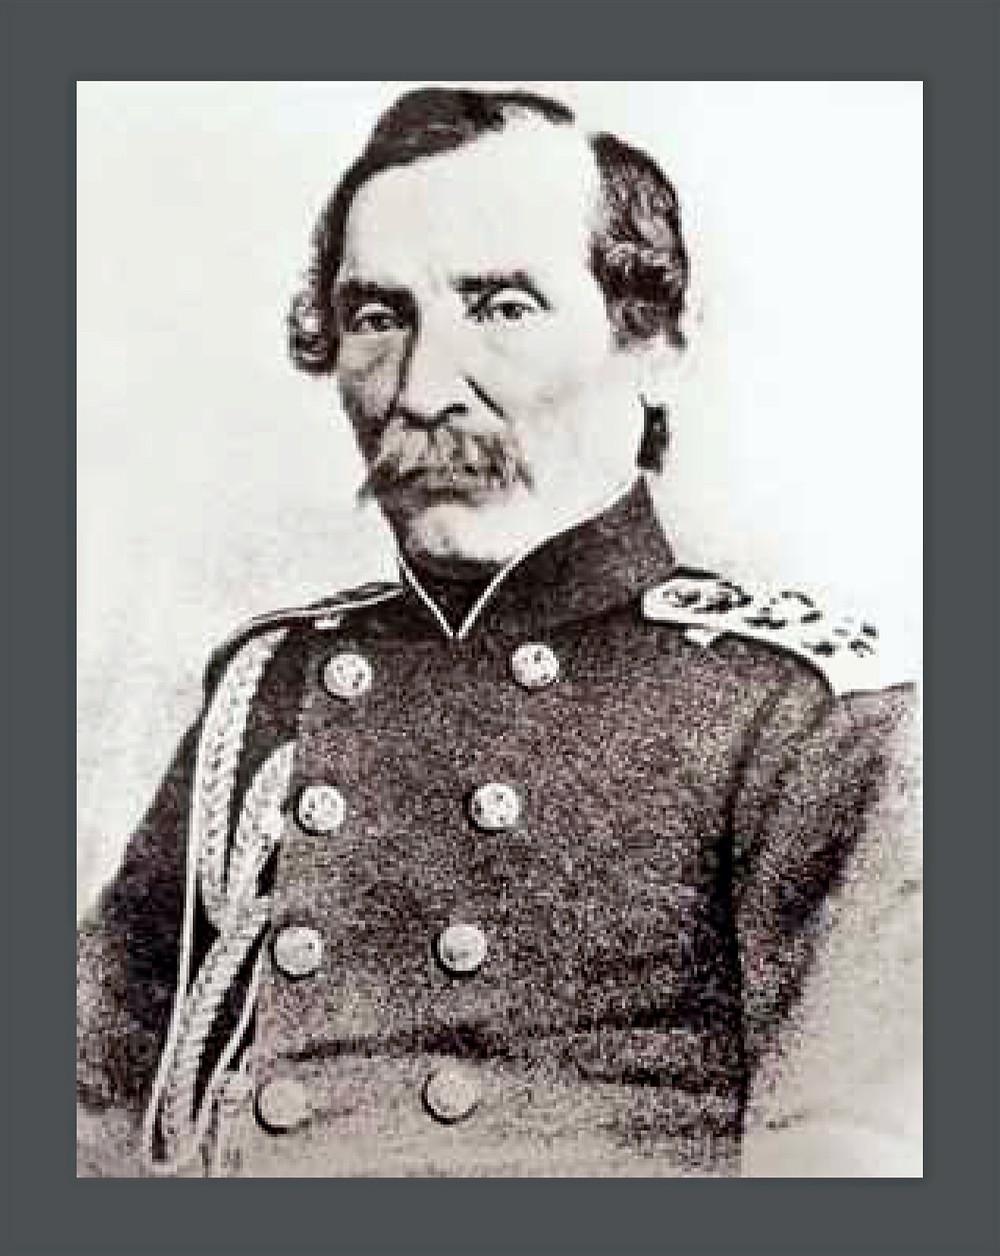 FILE PHOTO: Yevfimiy Putyatin (1803-1883) ©Wikimedia / Public Domain